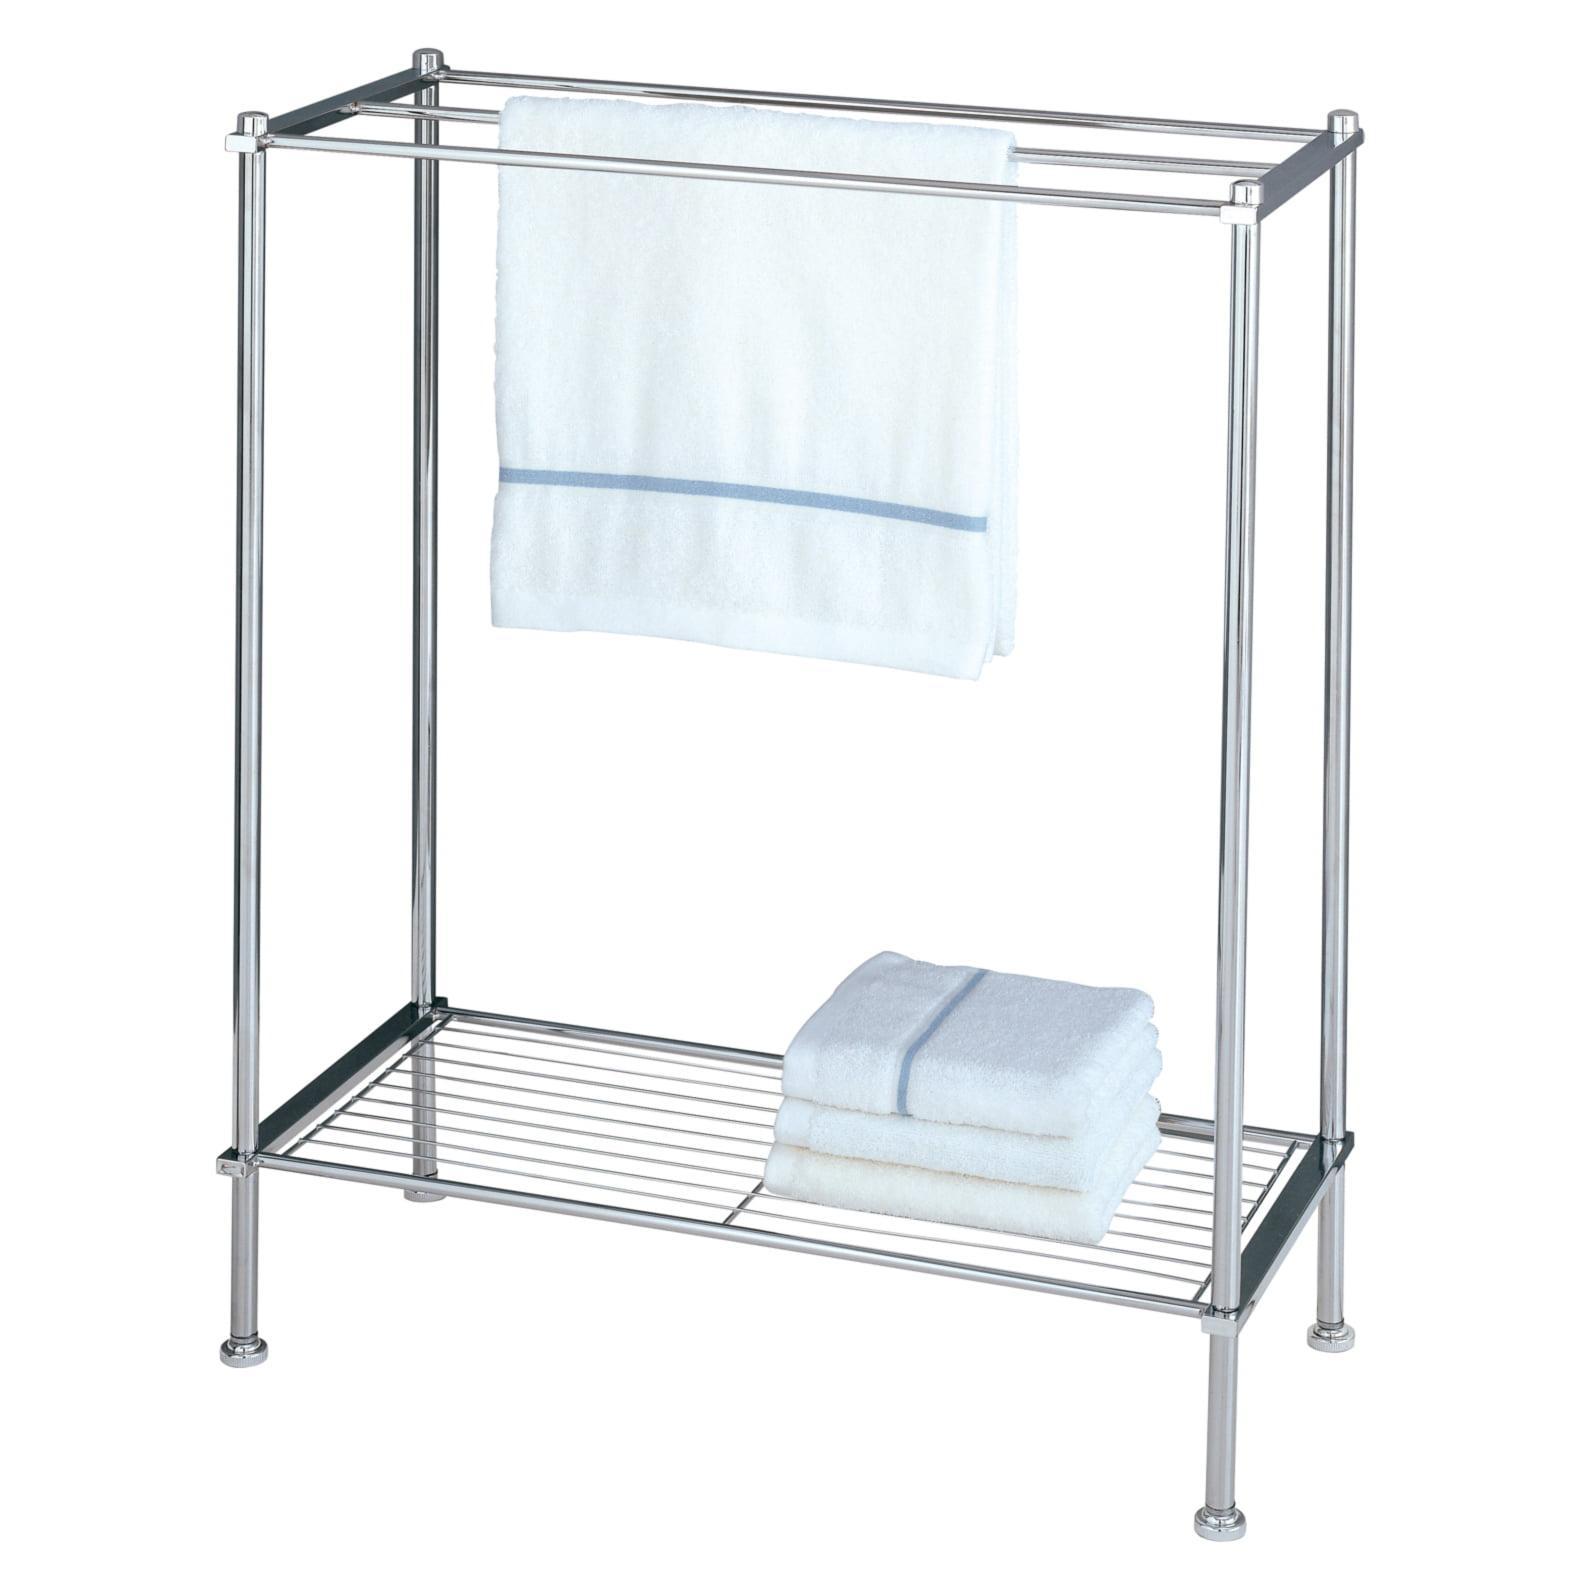 Organize It All 16986 Chrome Towel Rack